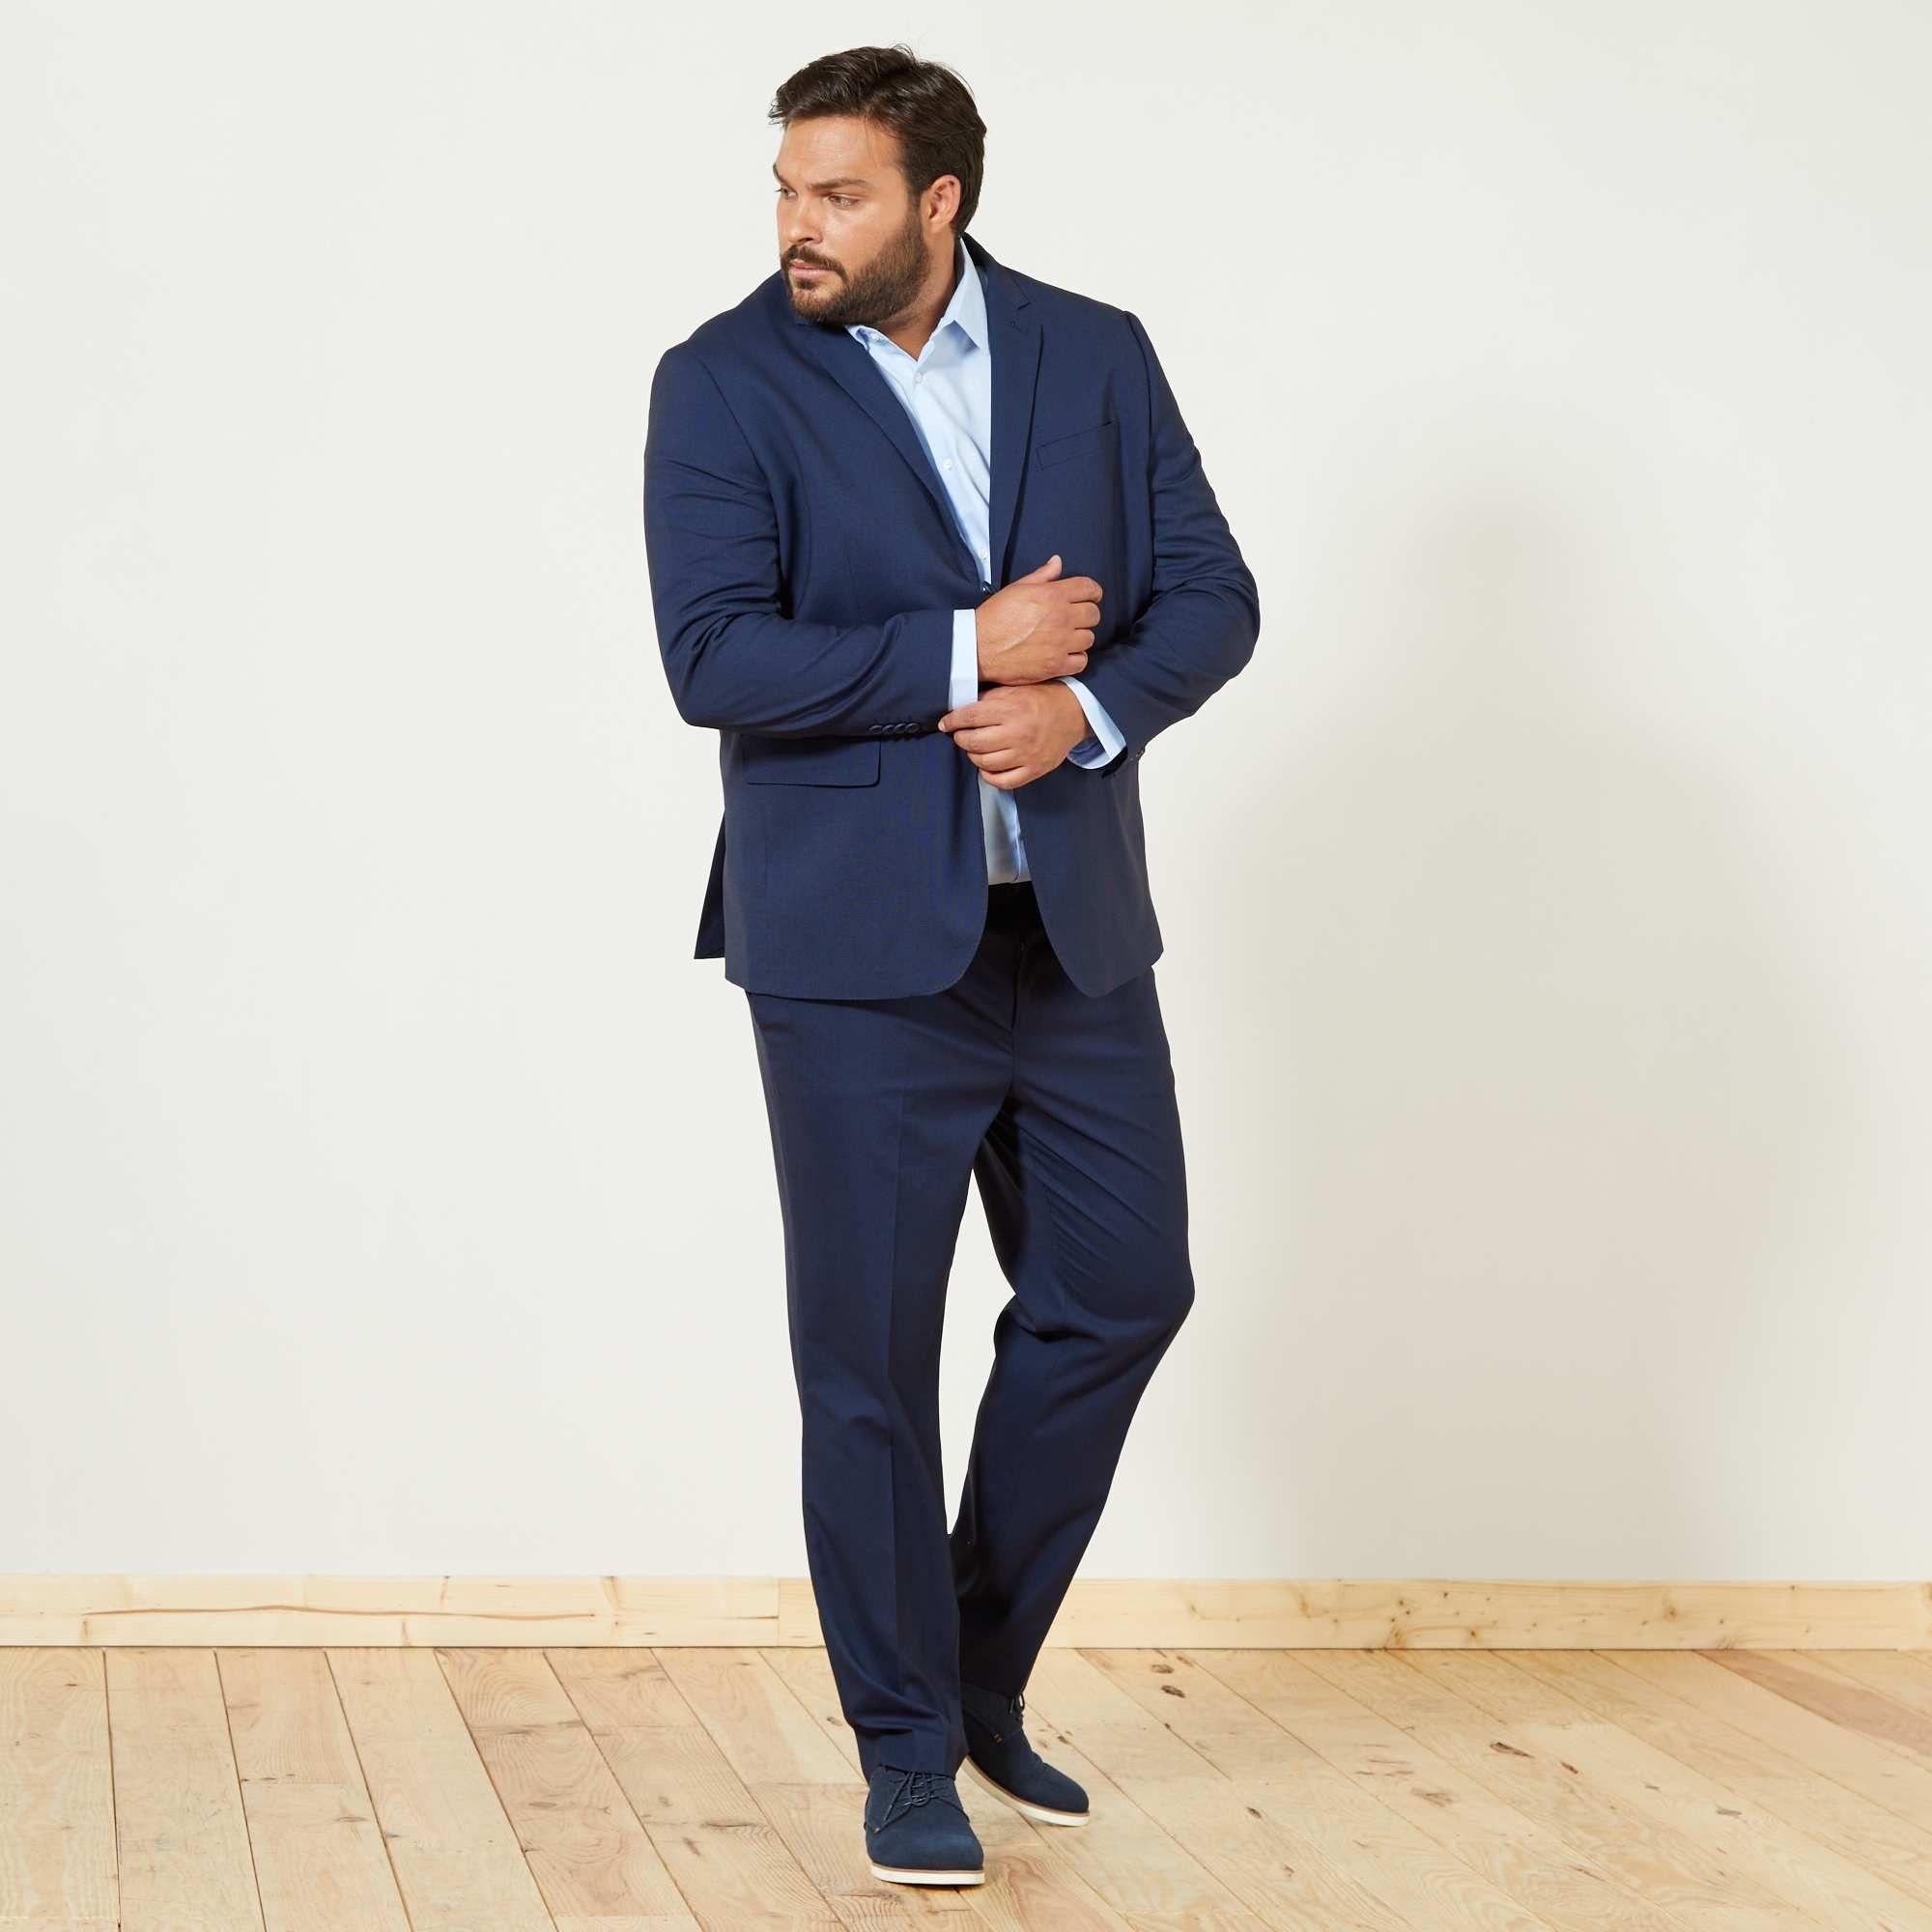 2a062ef1c63a Pantaloni abito caviale regular Taglie forti uomo - BLU - Kiabi - 35